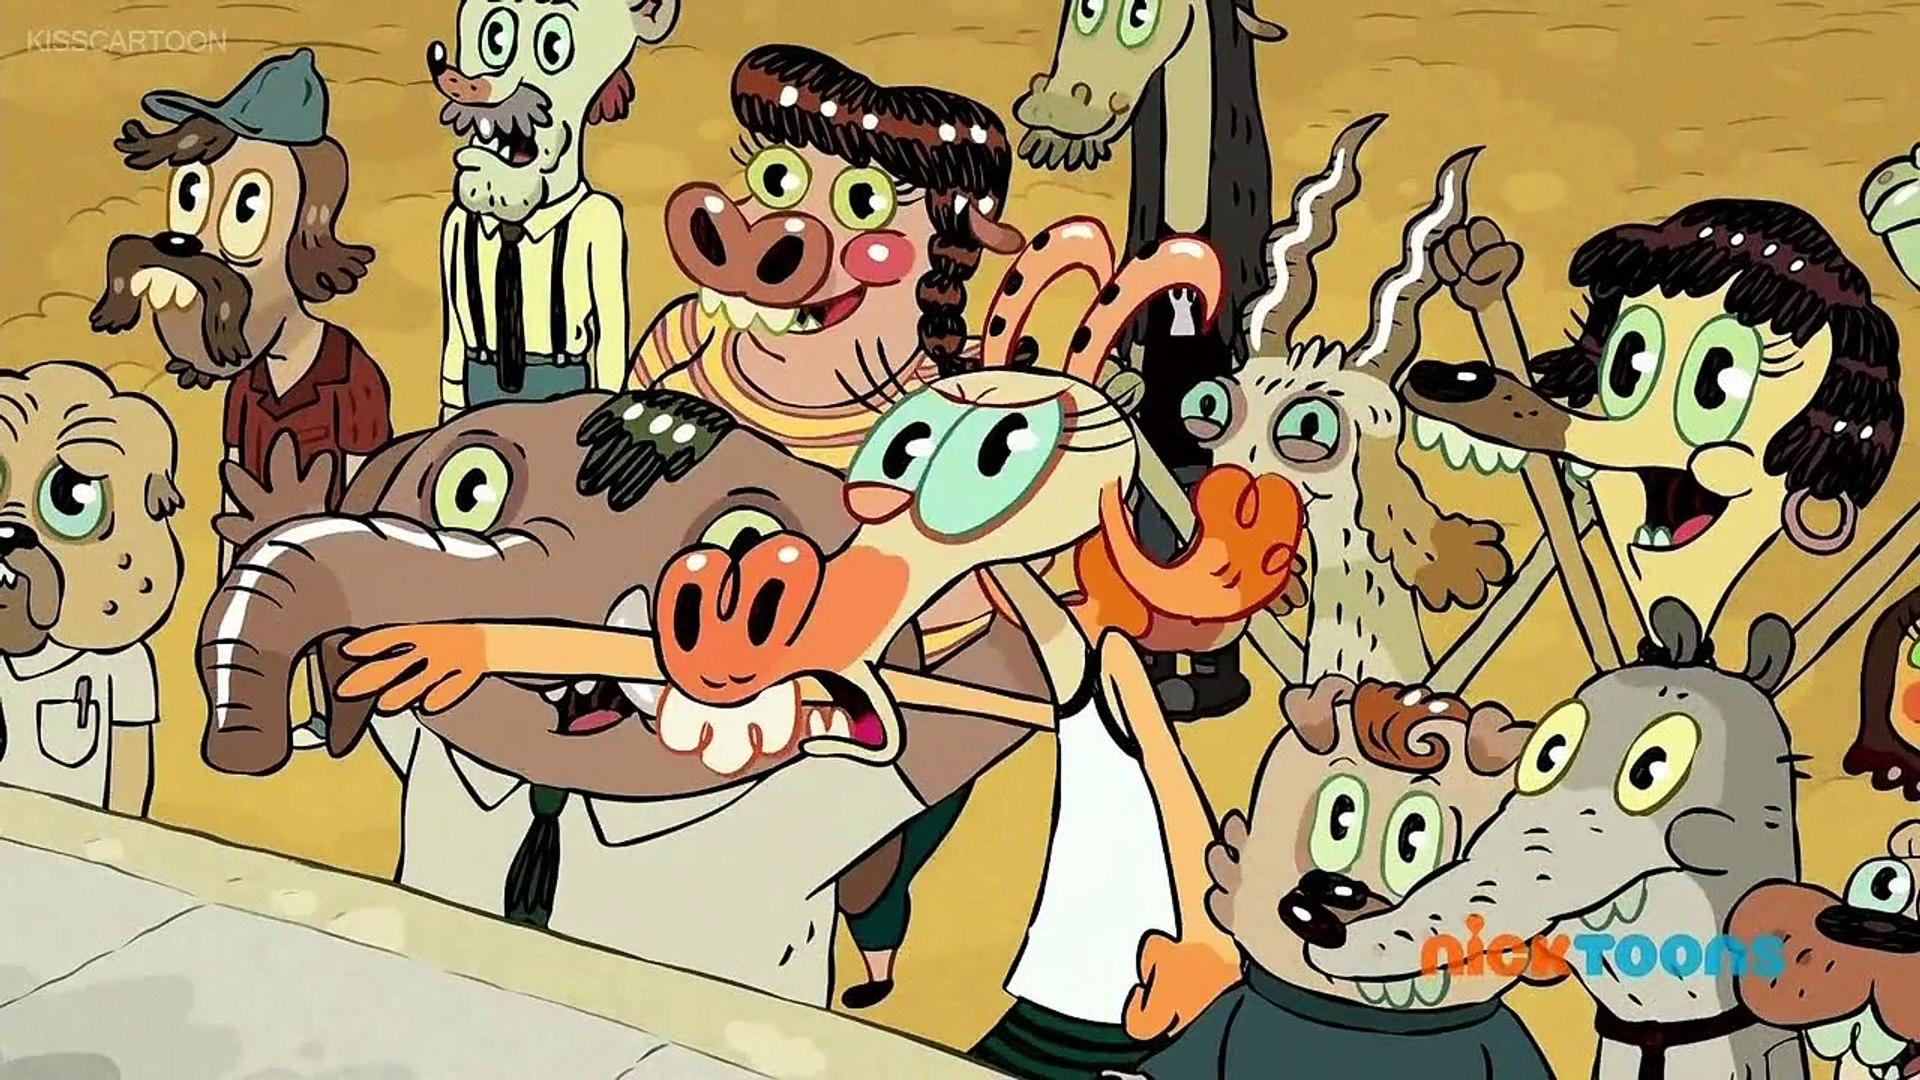 Pig Goat Banana Cricket Season 2 Episode 1 Road Trippin